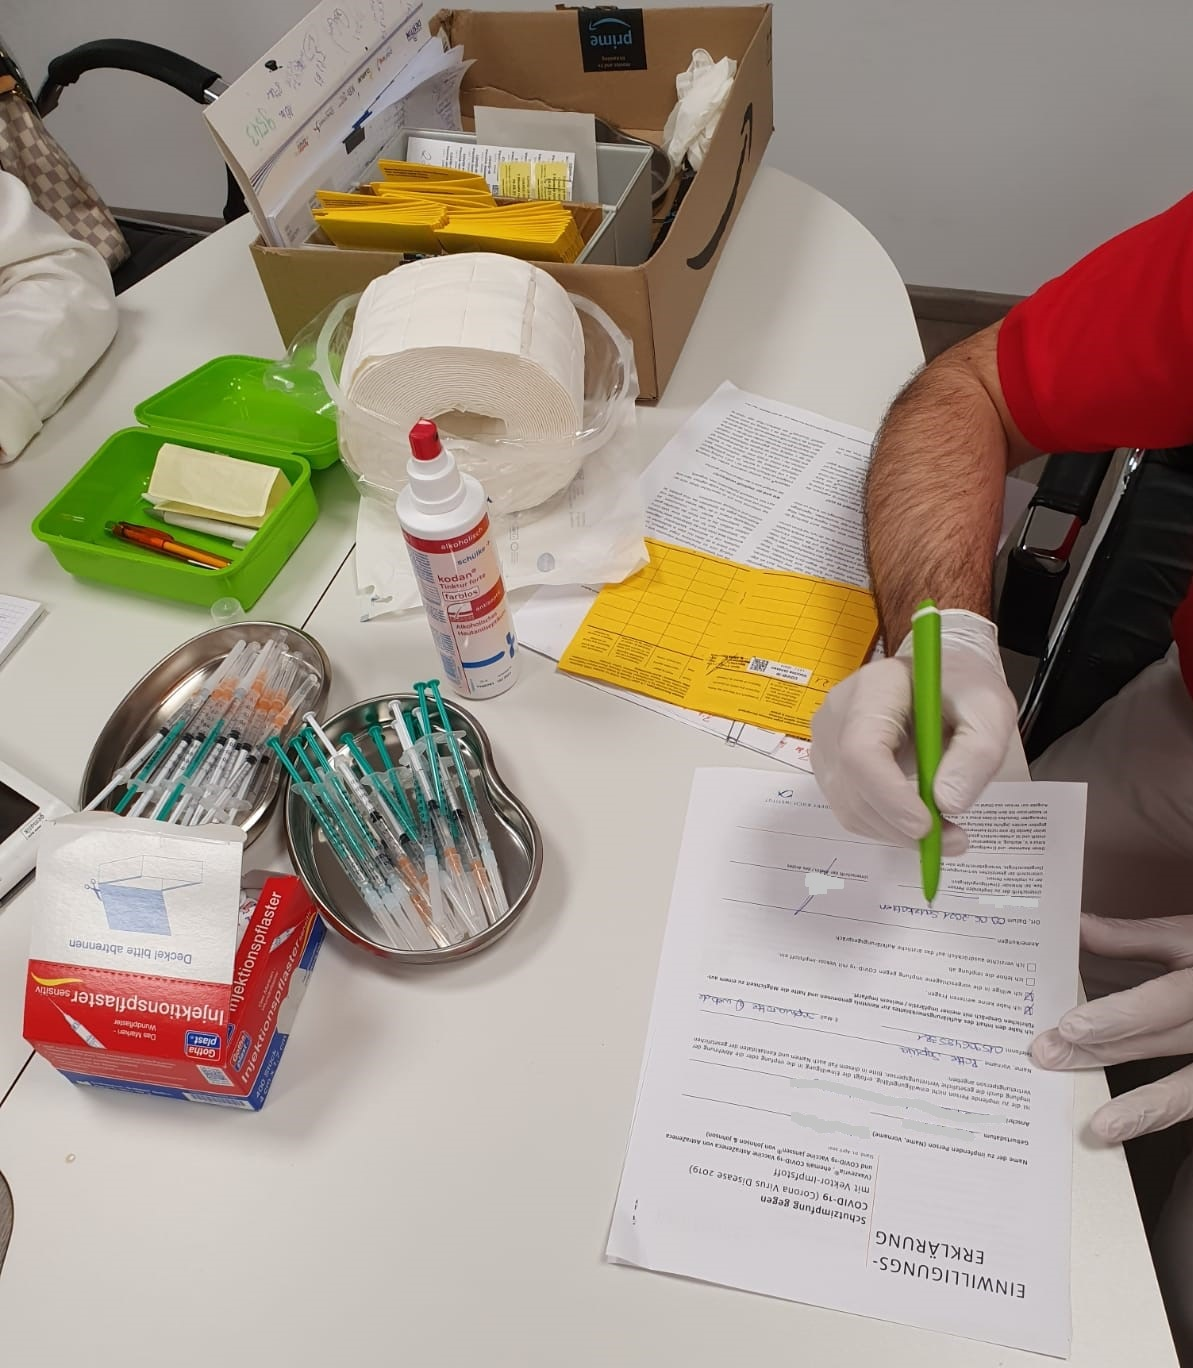 Rotte Impfaktion gegen das Corona Virus